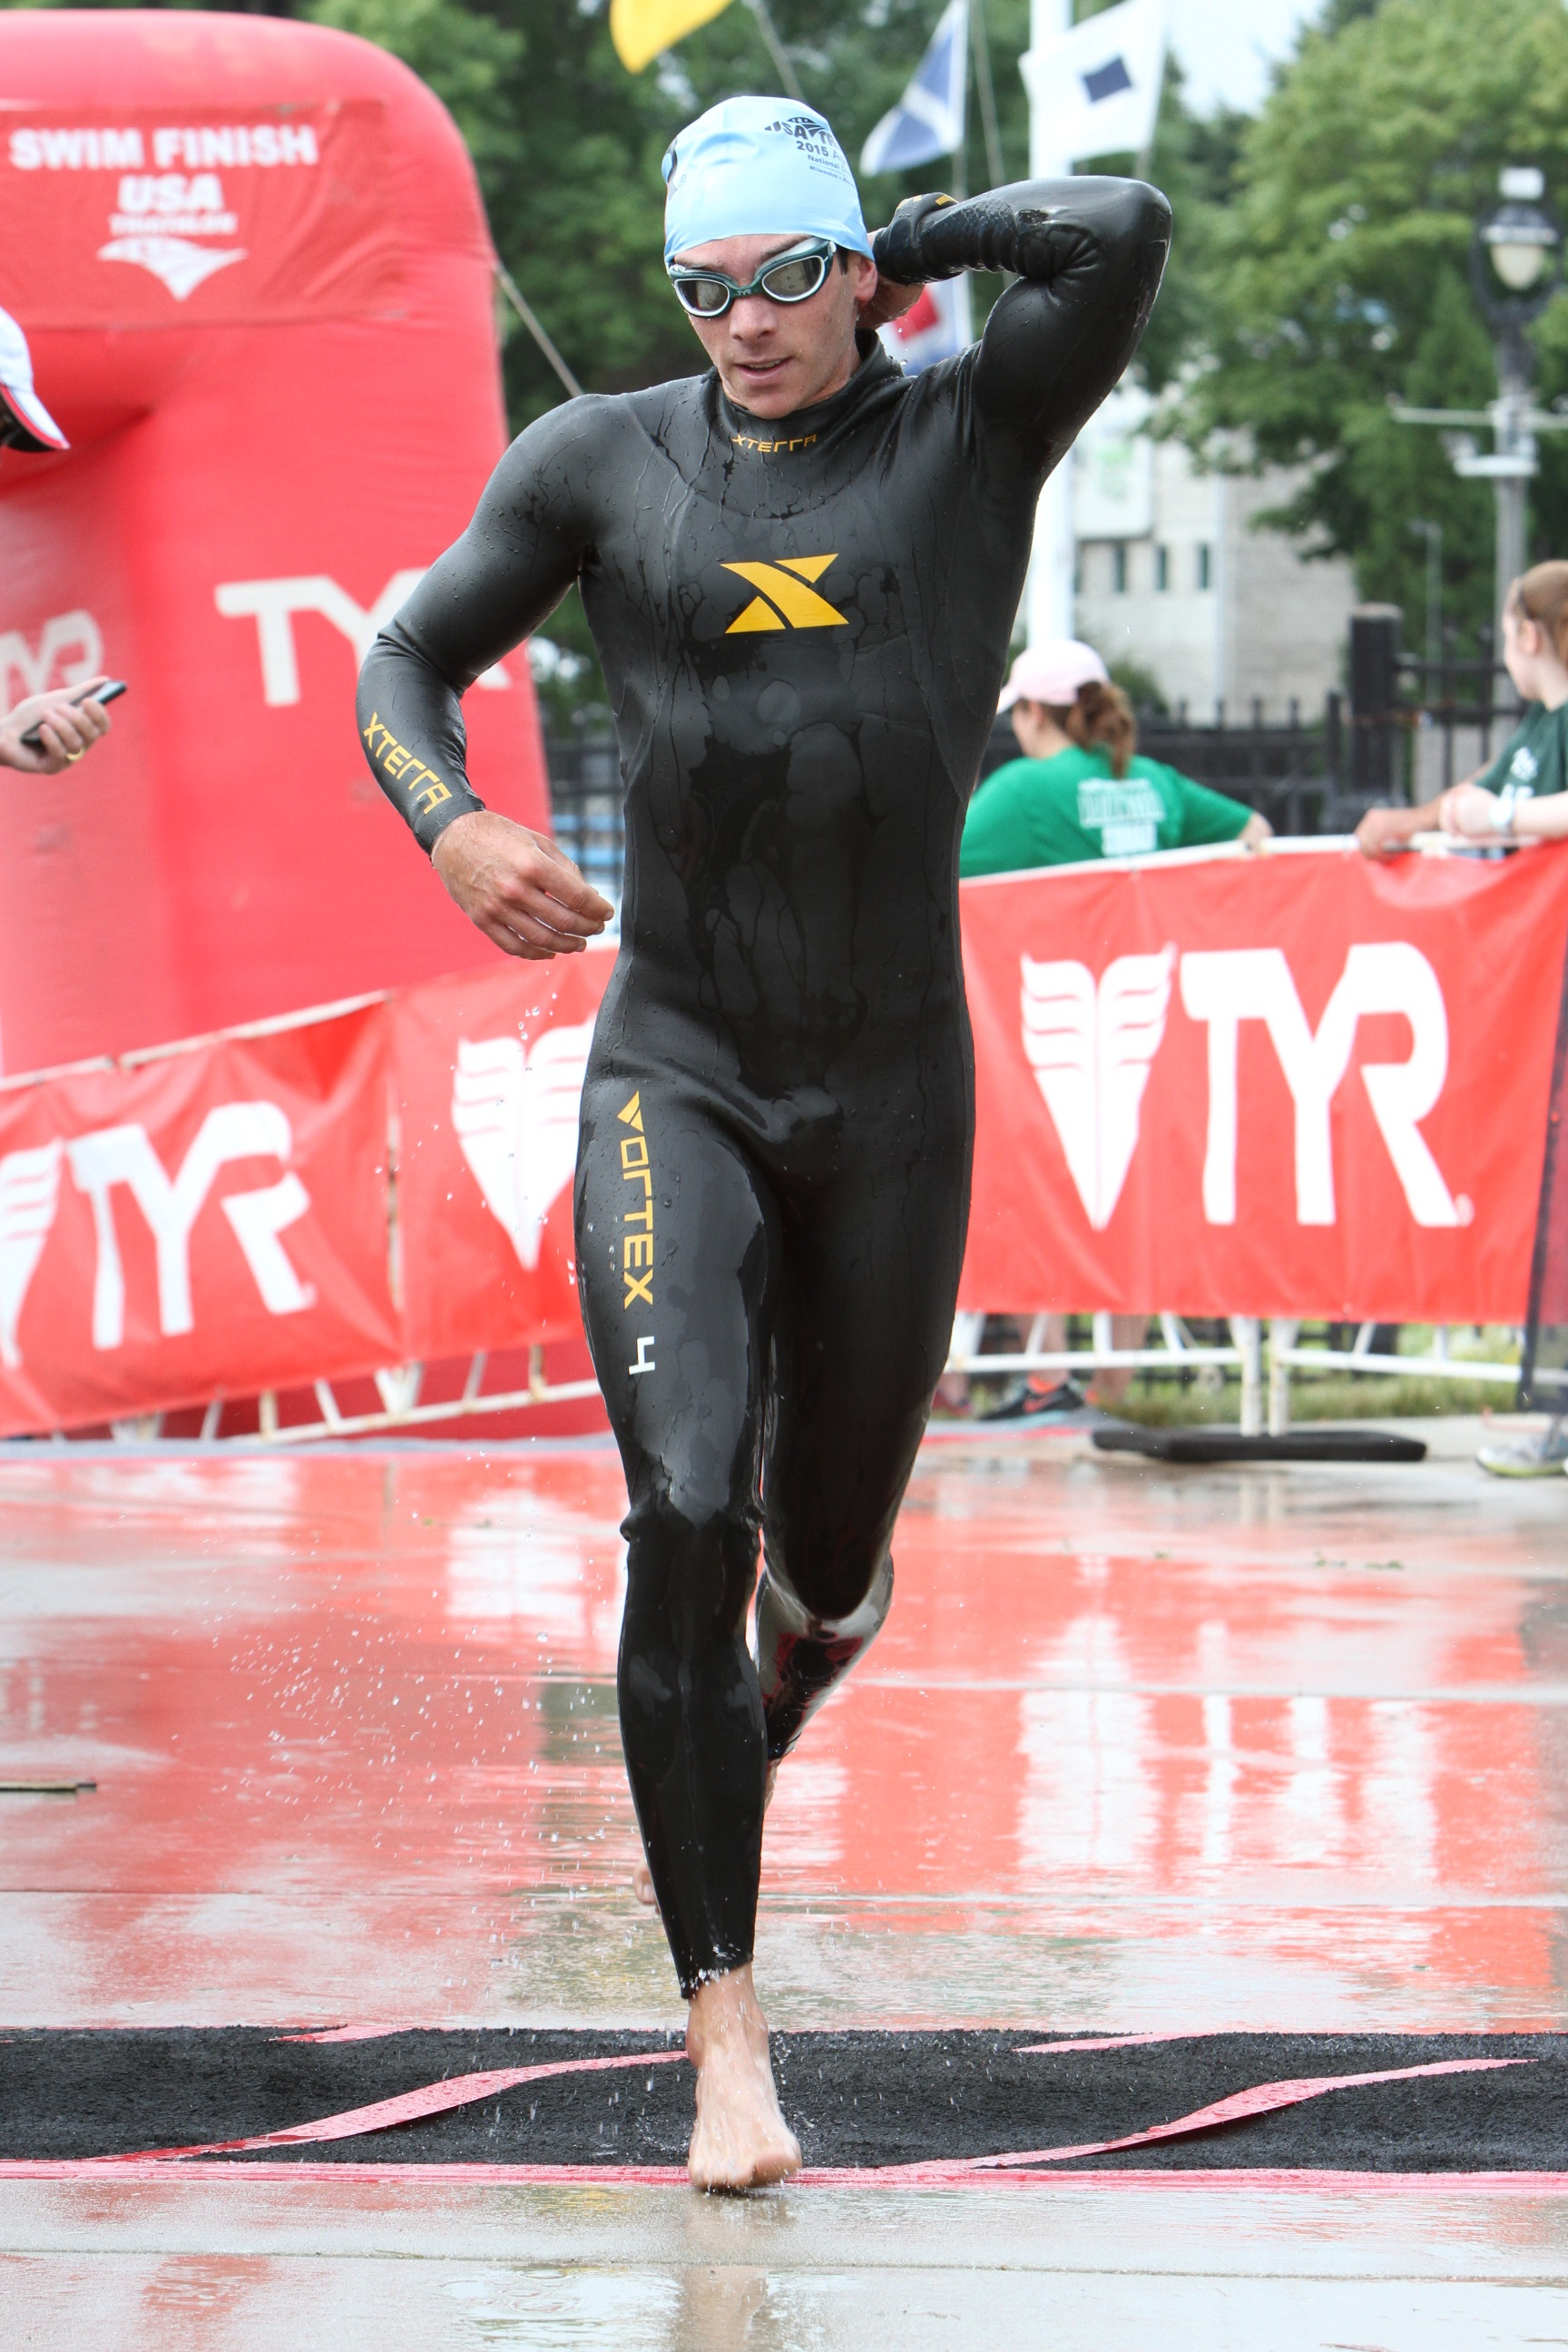 2015 USAT AGNC Todd Swim1.jpeg